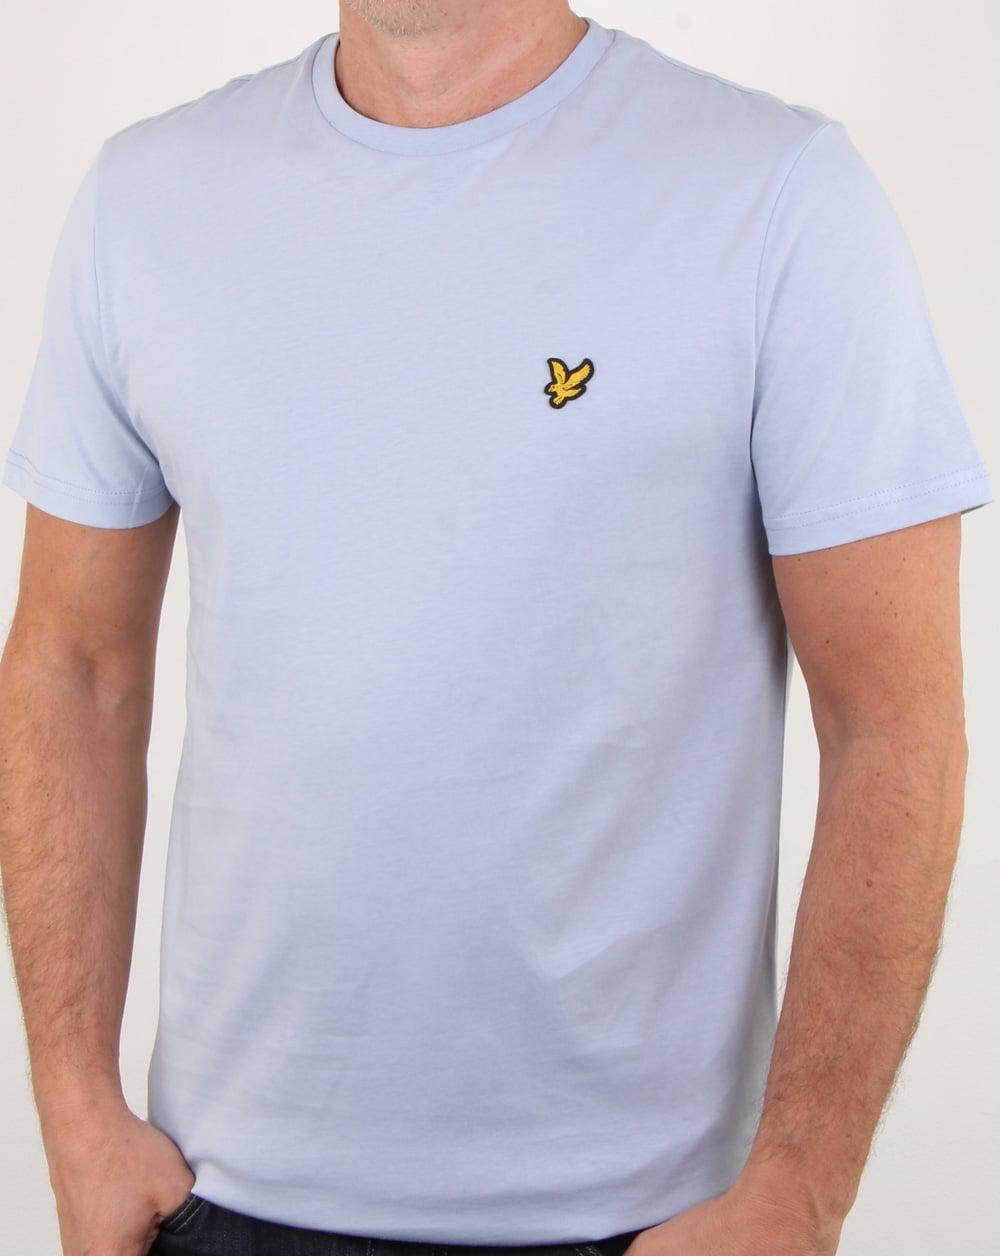 e0c3e017 Lyle And Scott T-shirt Stonewash Blue, Mens, Tee, Cotton, Crew Neck